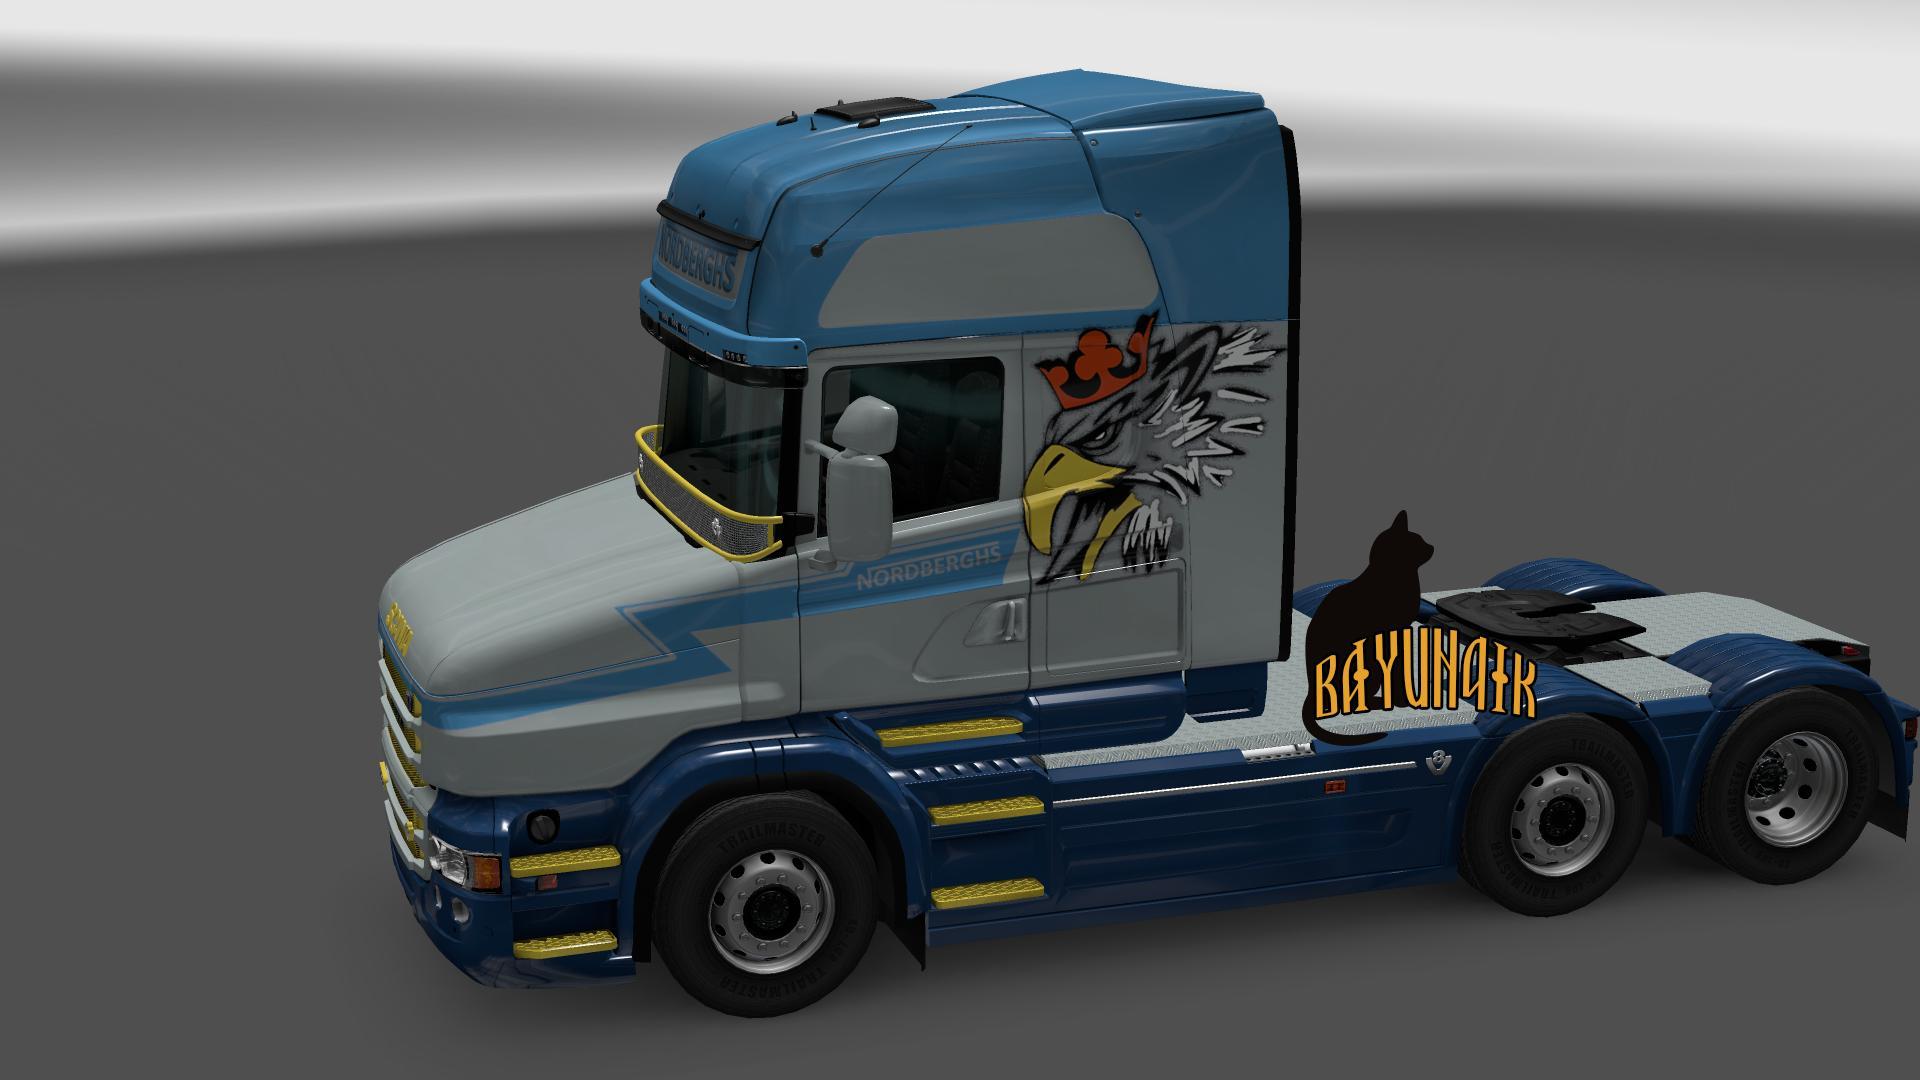 scania t series nordberghs skin 123 mod euro truck